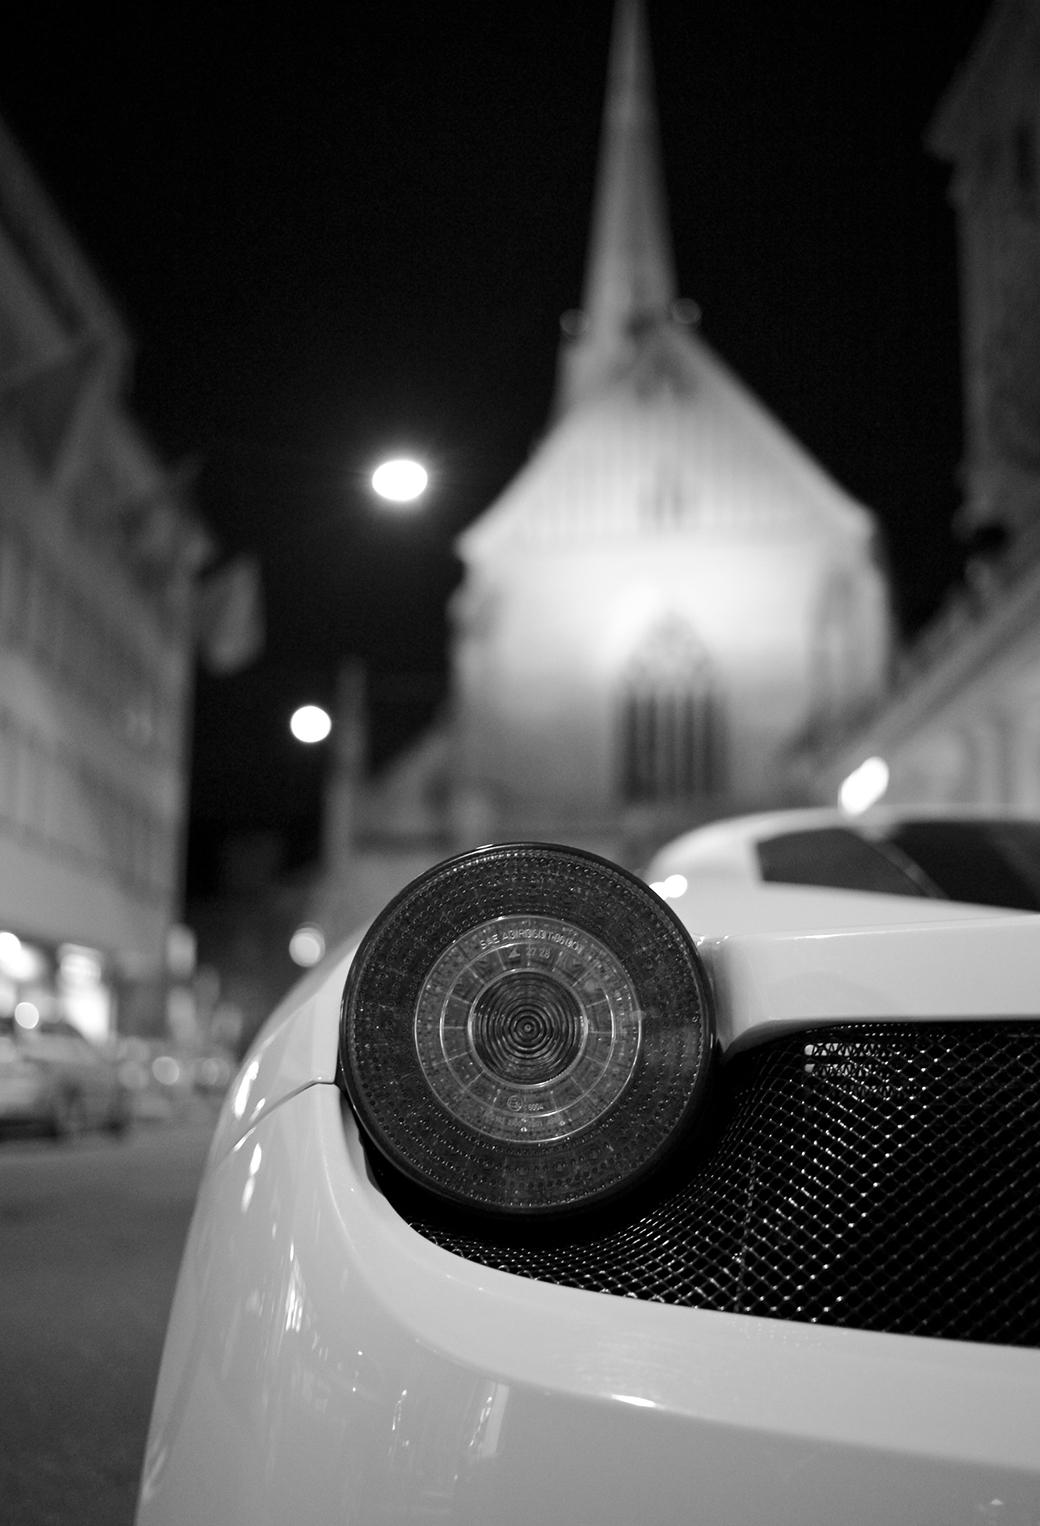 Street photography Ferrari 3Wallpapers iPhone Parallax Street photography Ferrari